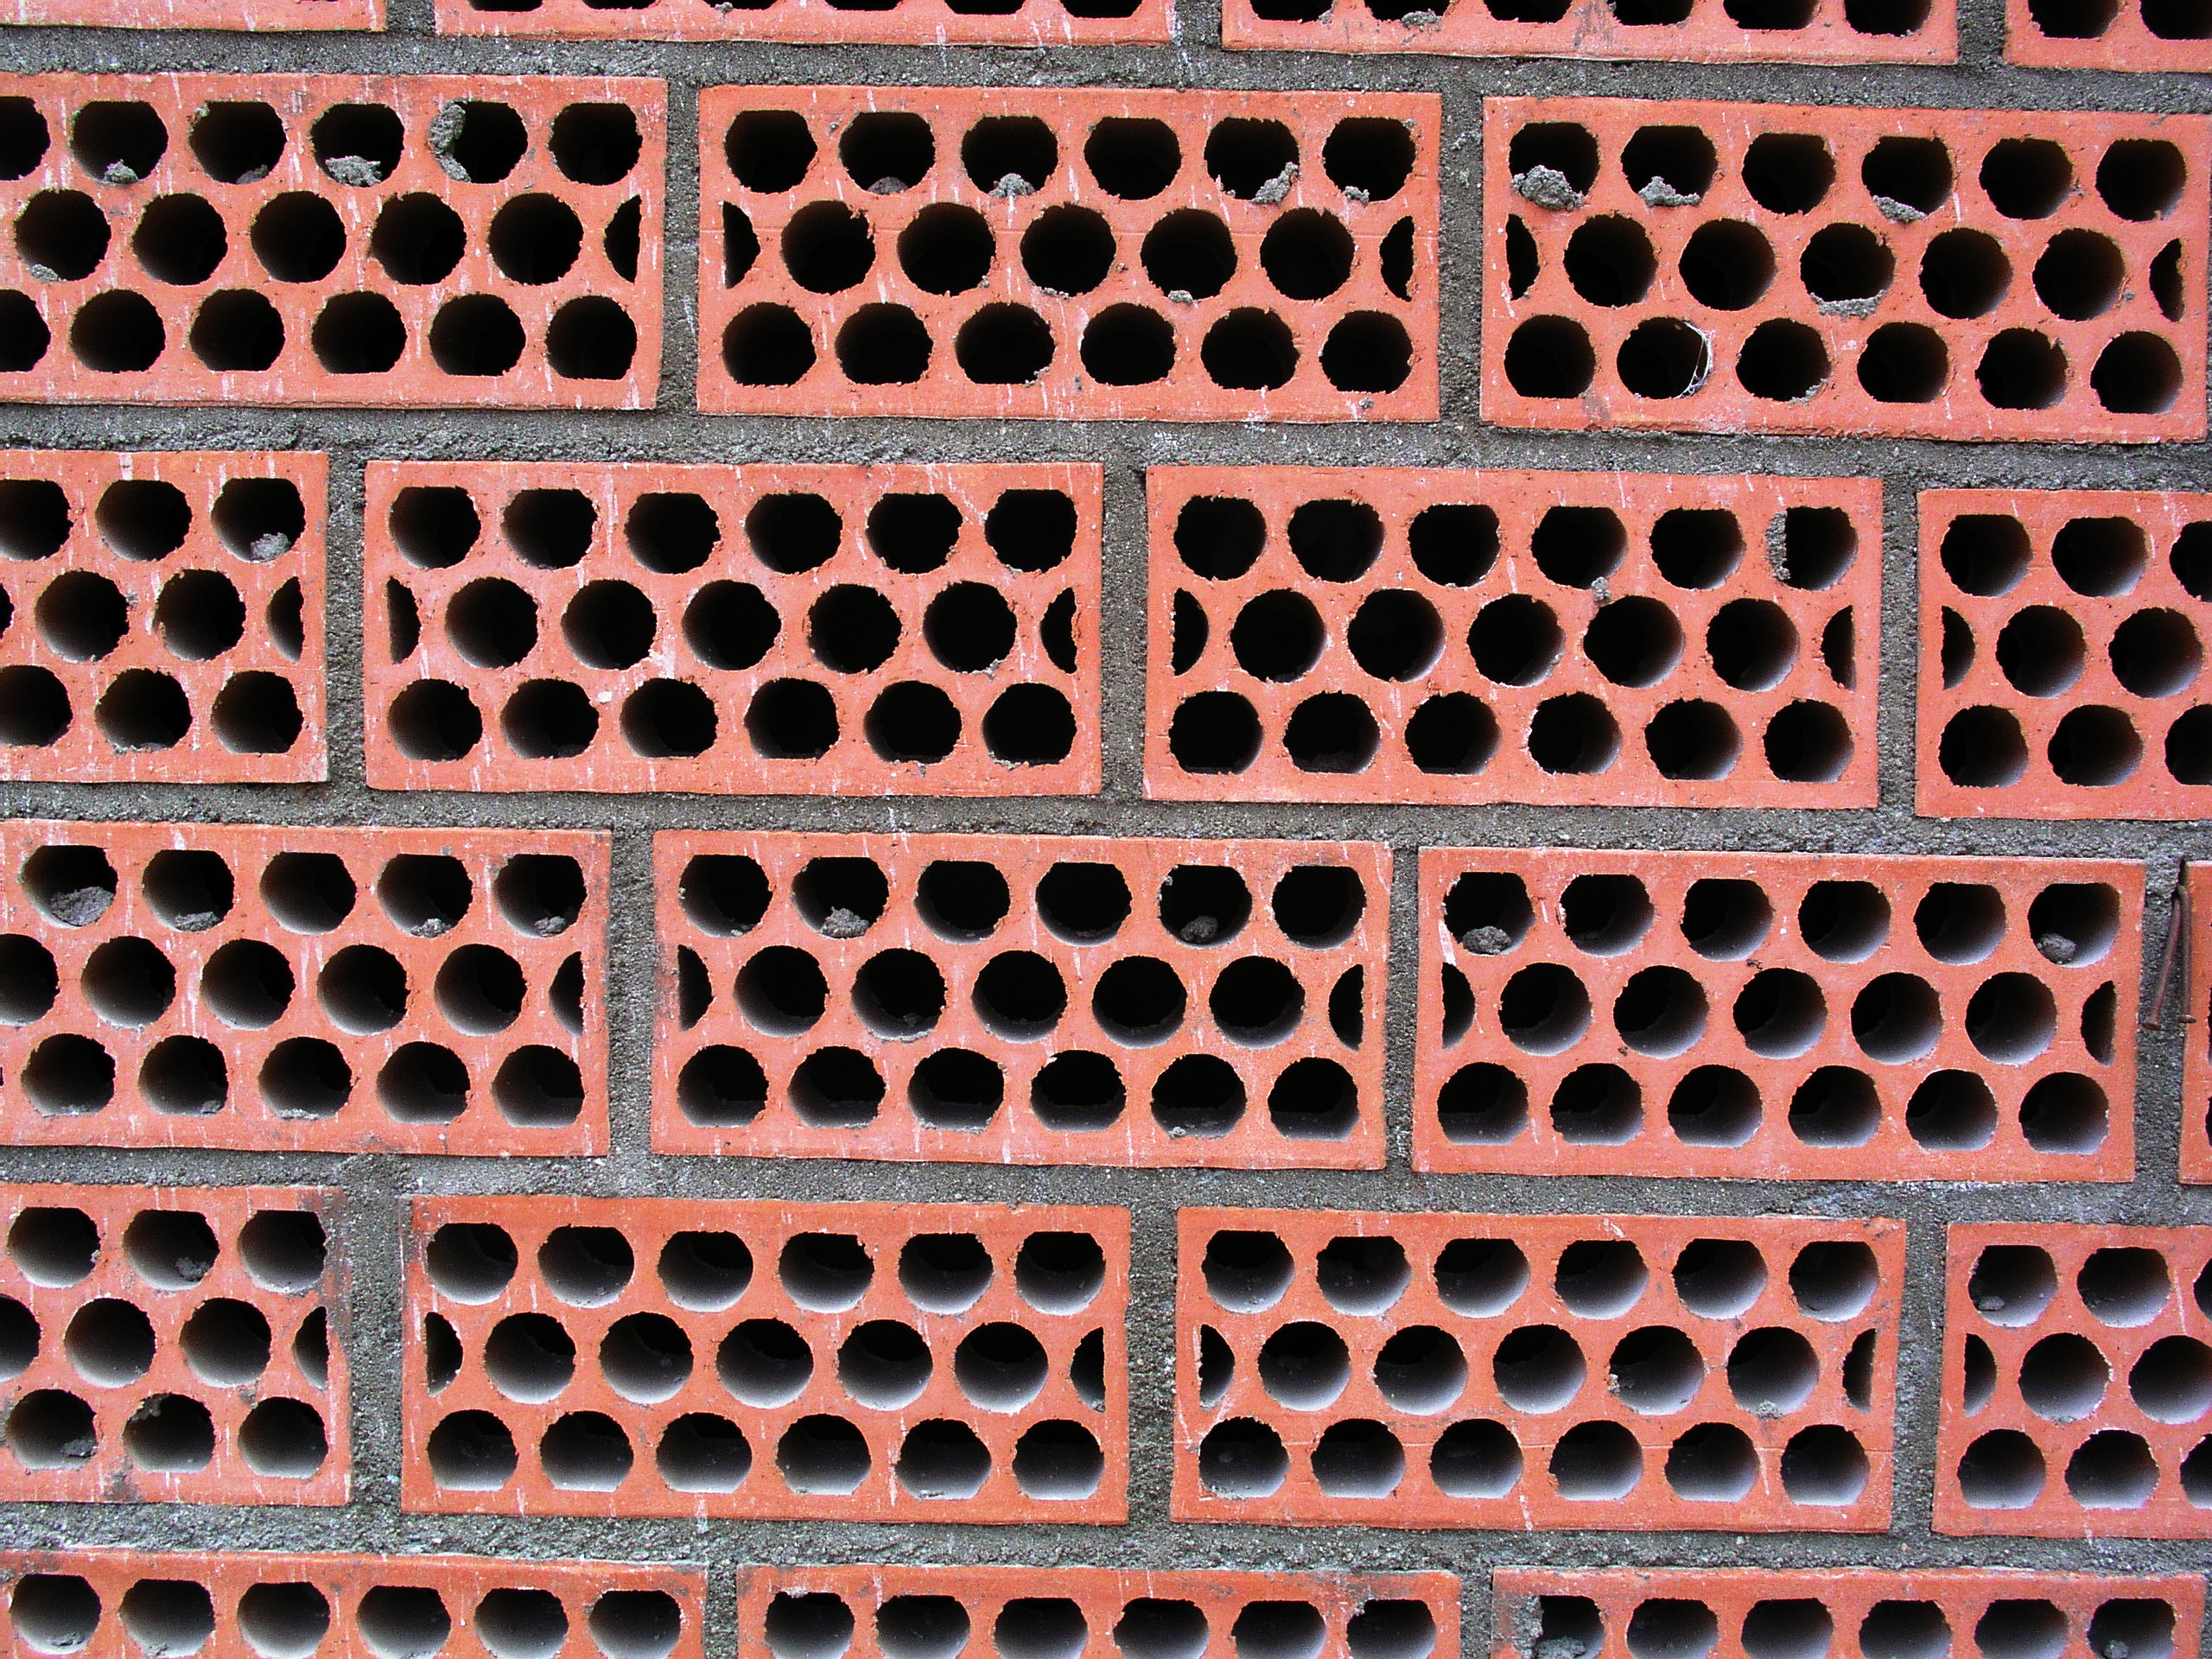 Datei:Guadalajara Hole brick wall.jpg – Wikipedia